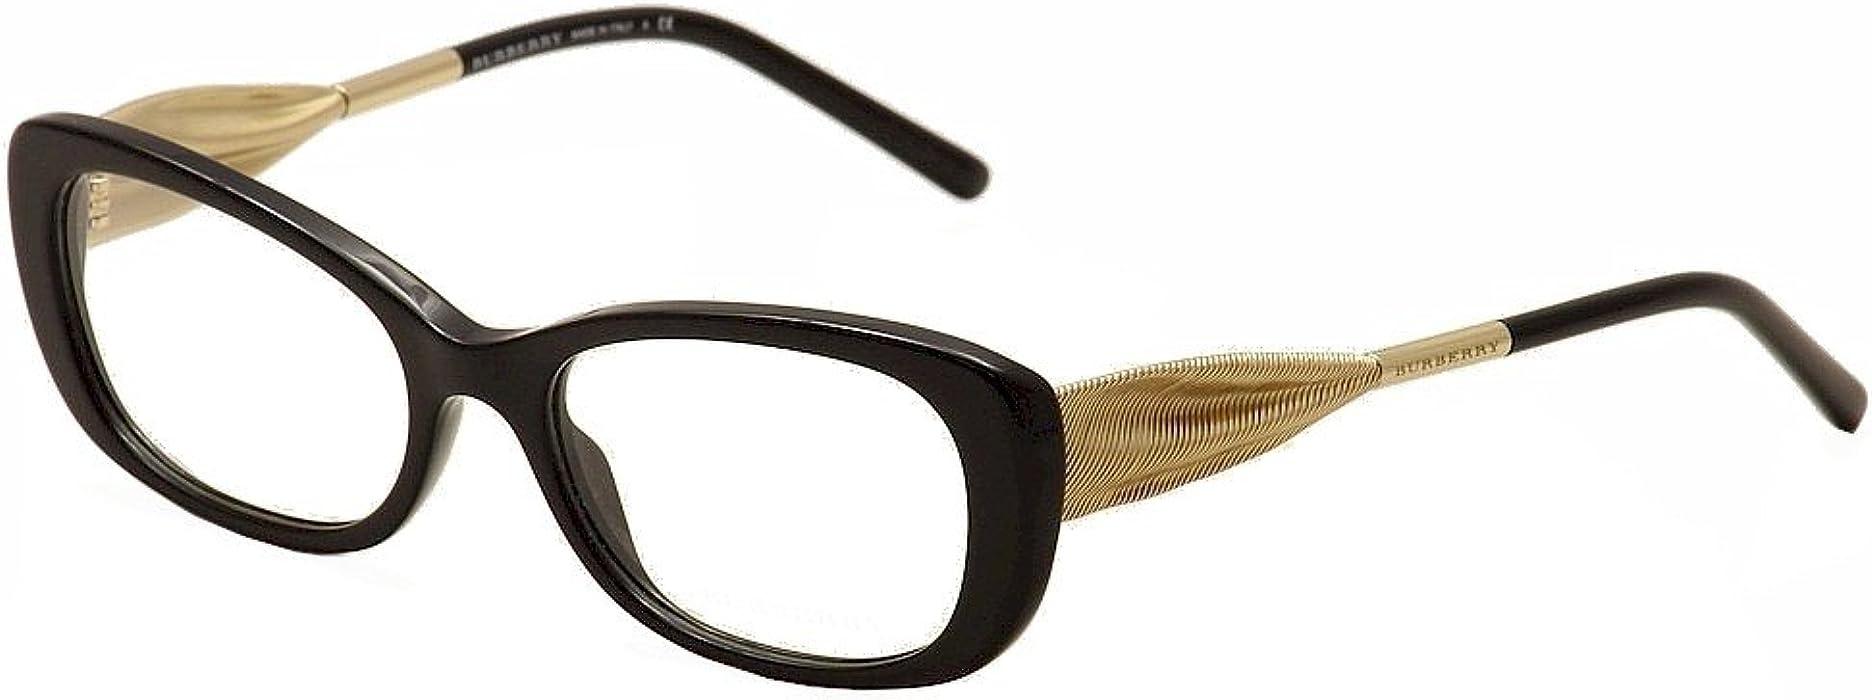 bd0ed00347c Burberry Women s BE2203 Eyeglasses Black 52mm at Amazon Women s ...